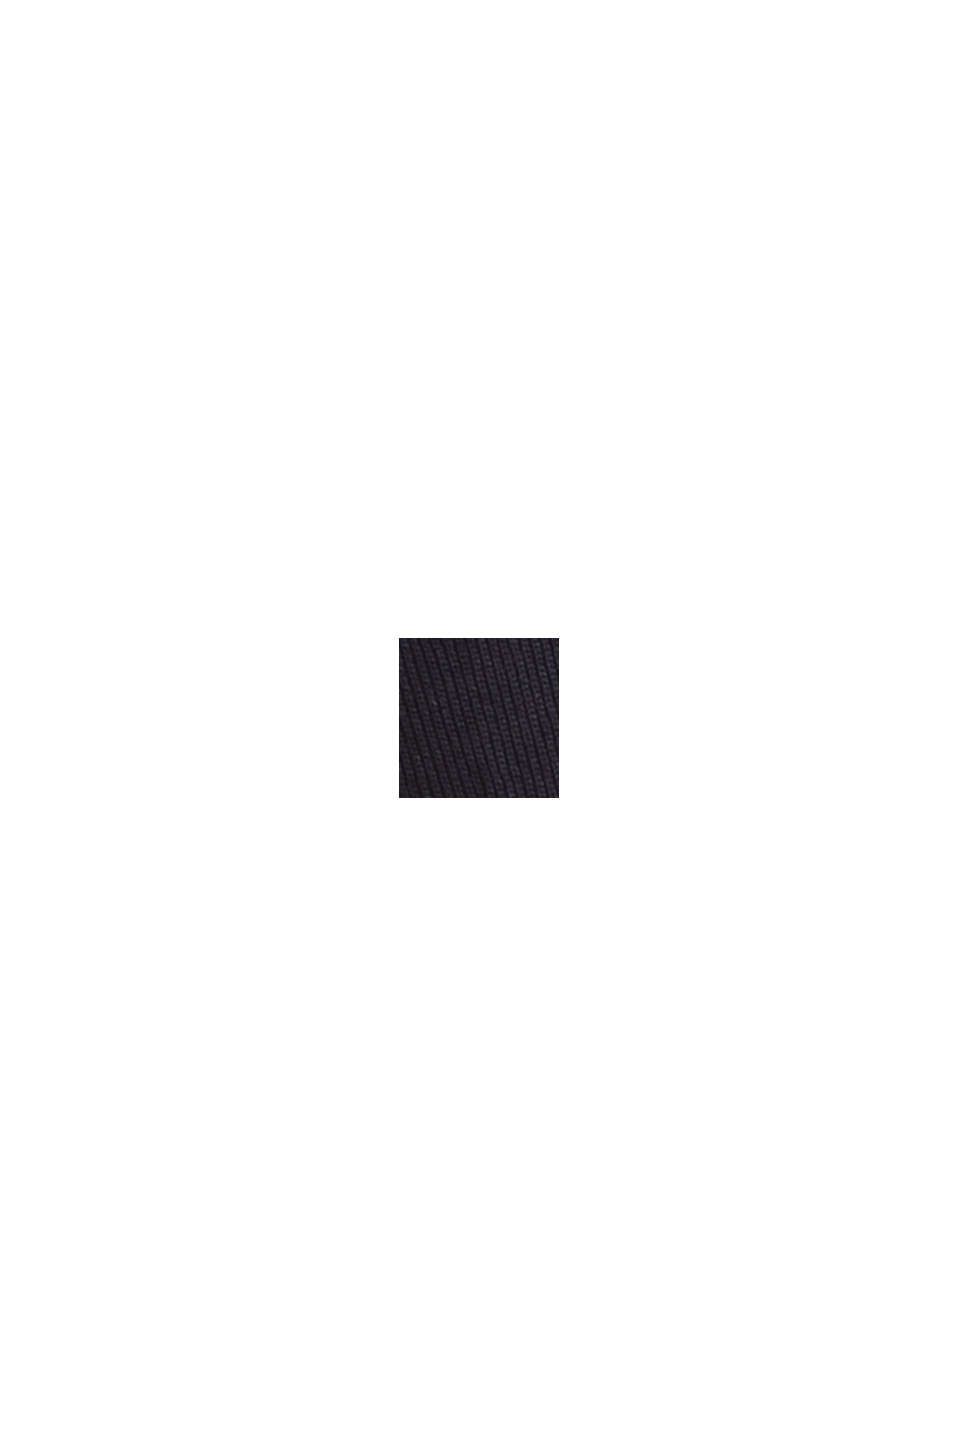 Camiseta de manga larga con cuello barco, NAVY, swatch